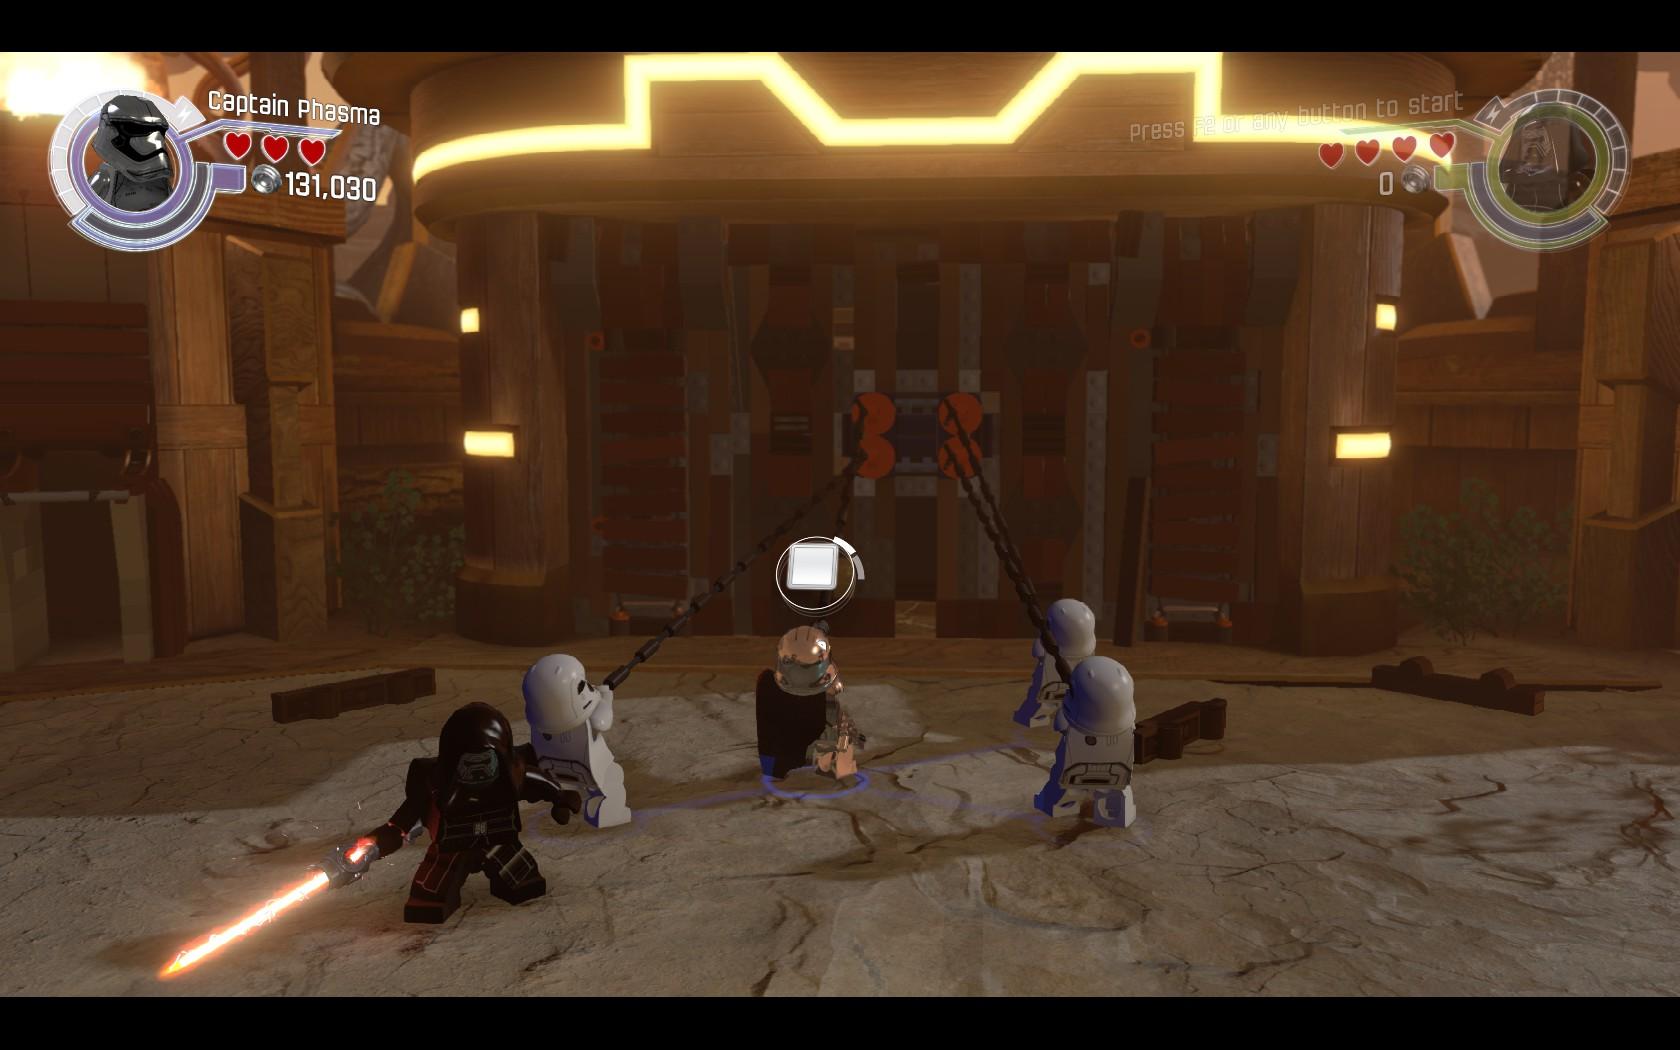 LEGO Star Wars: The Force Awakens - kostky se probouzí 126755